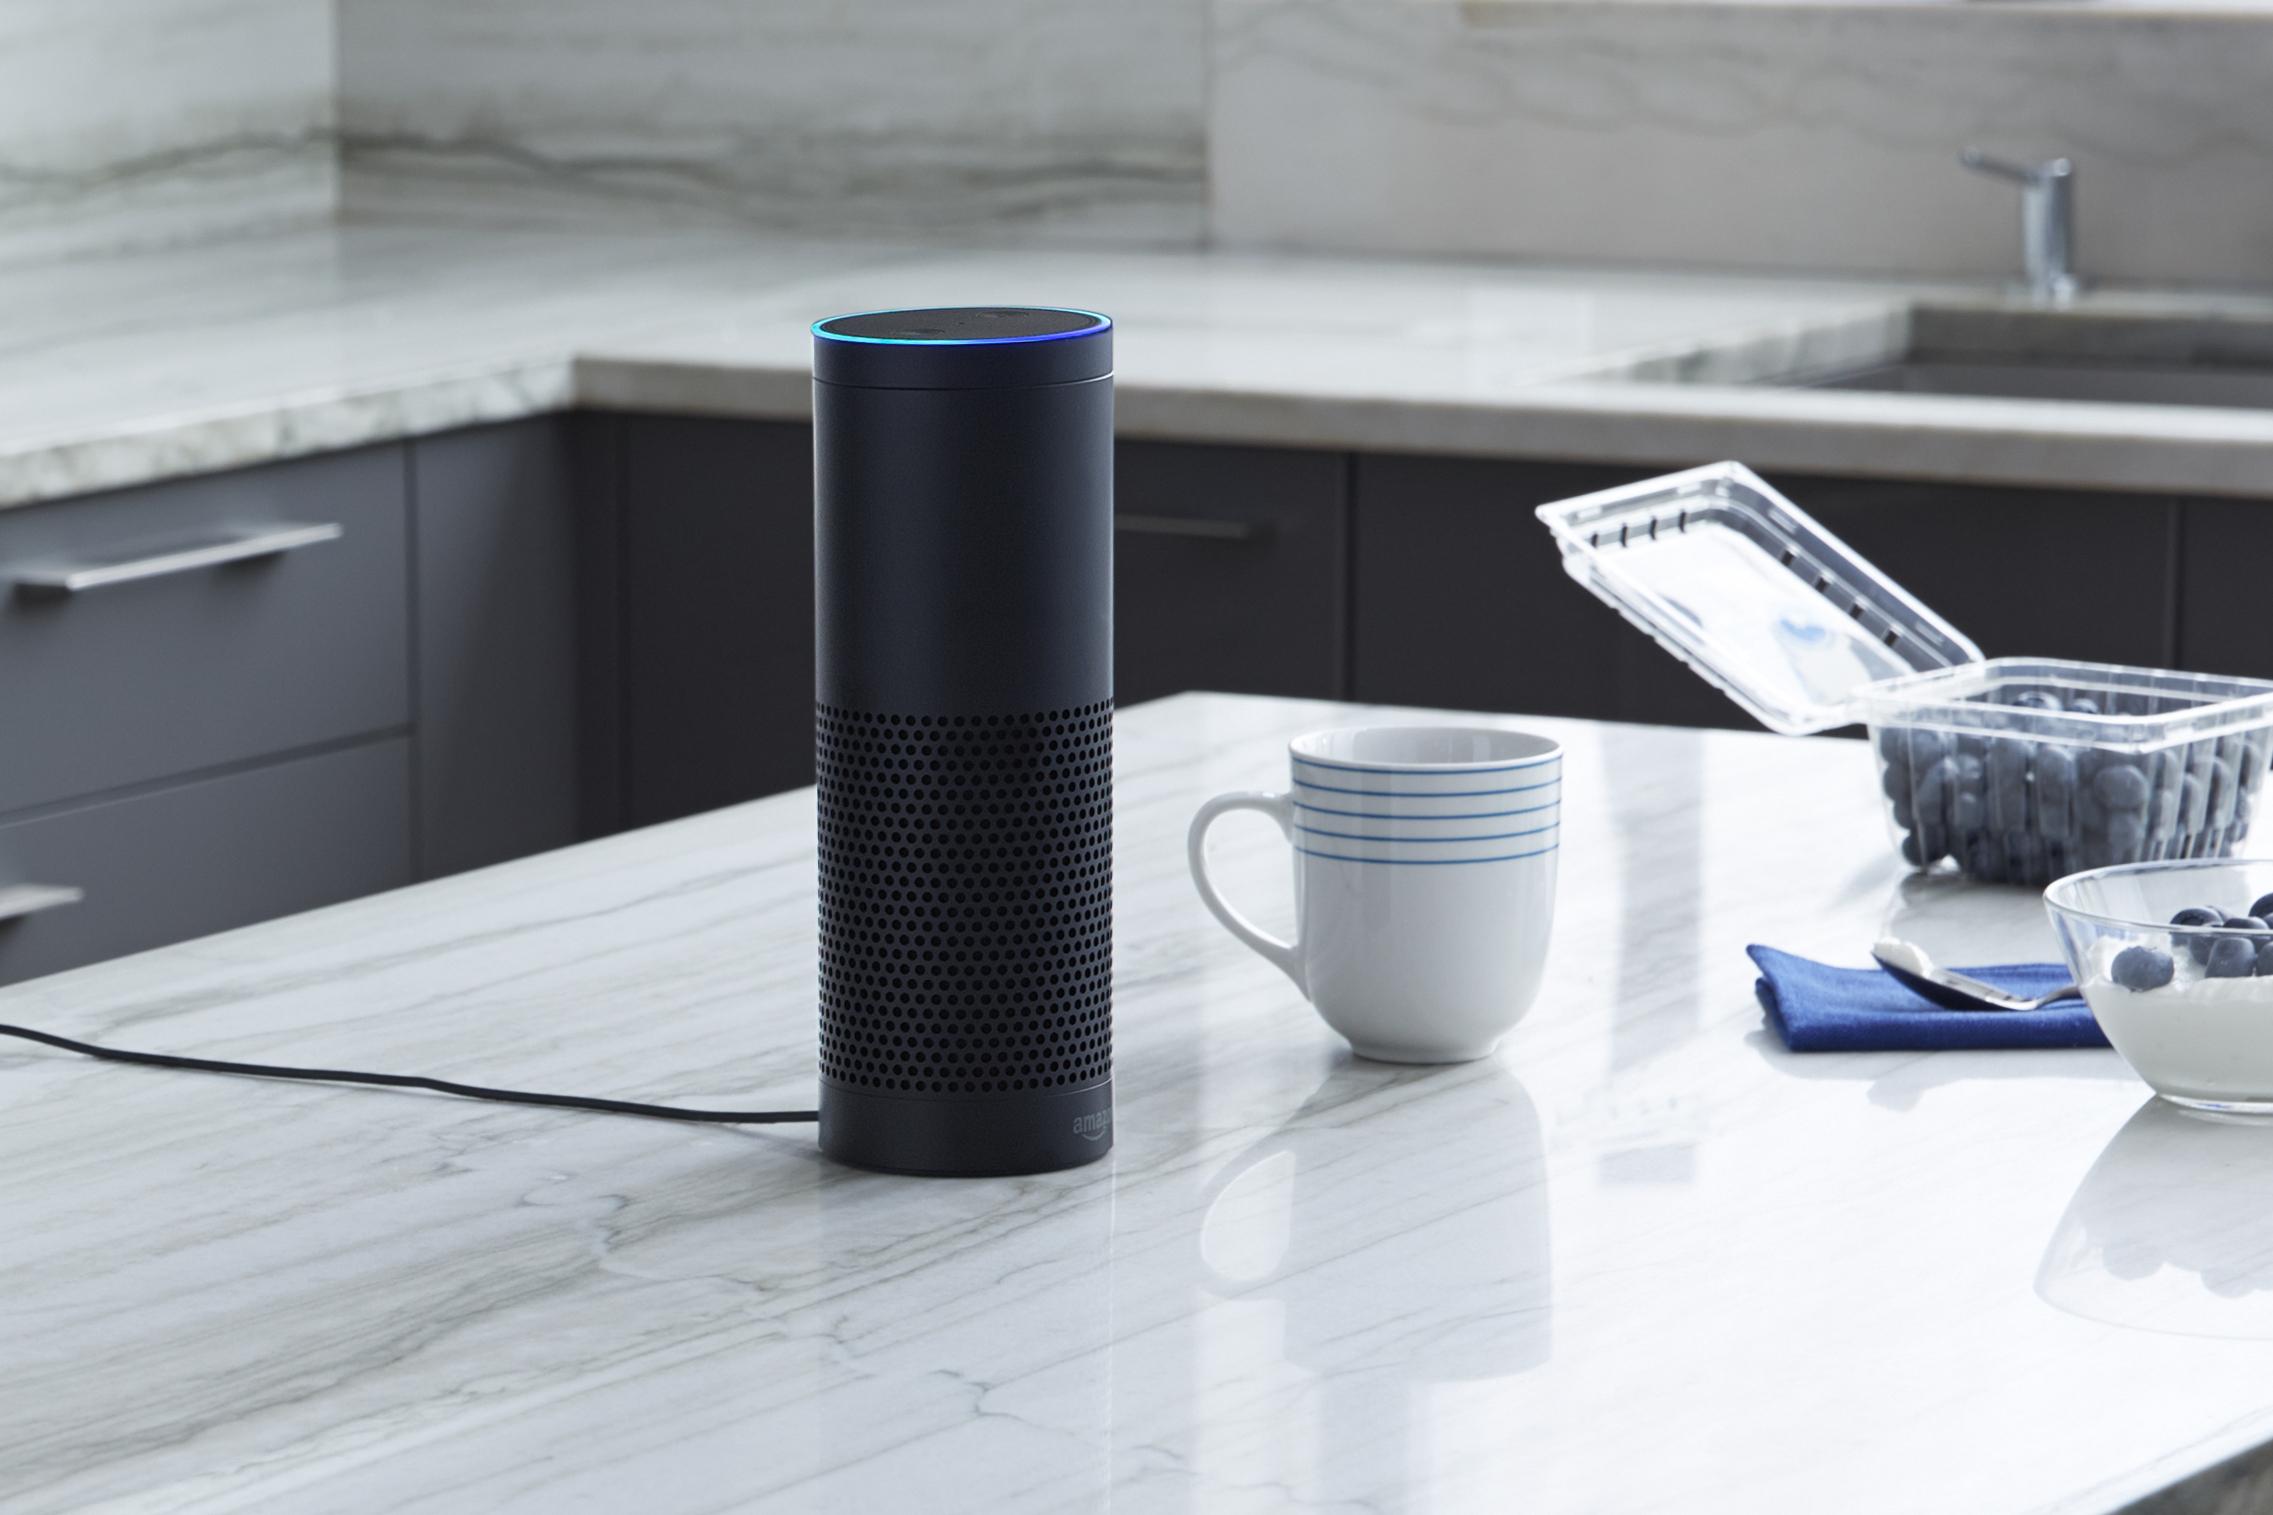 Amazon Echo in the kitchen